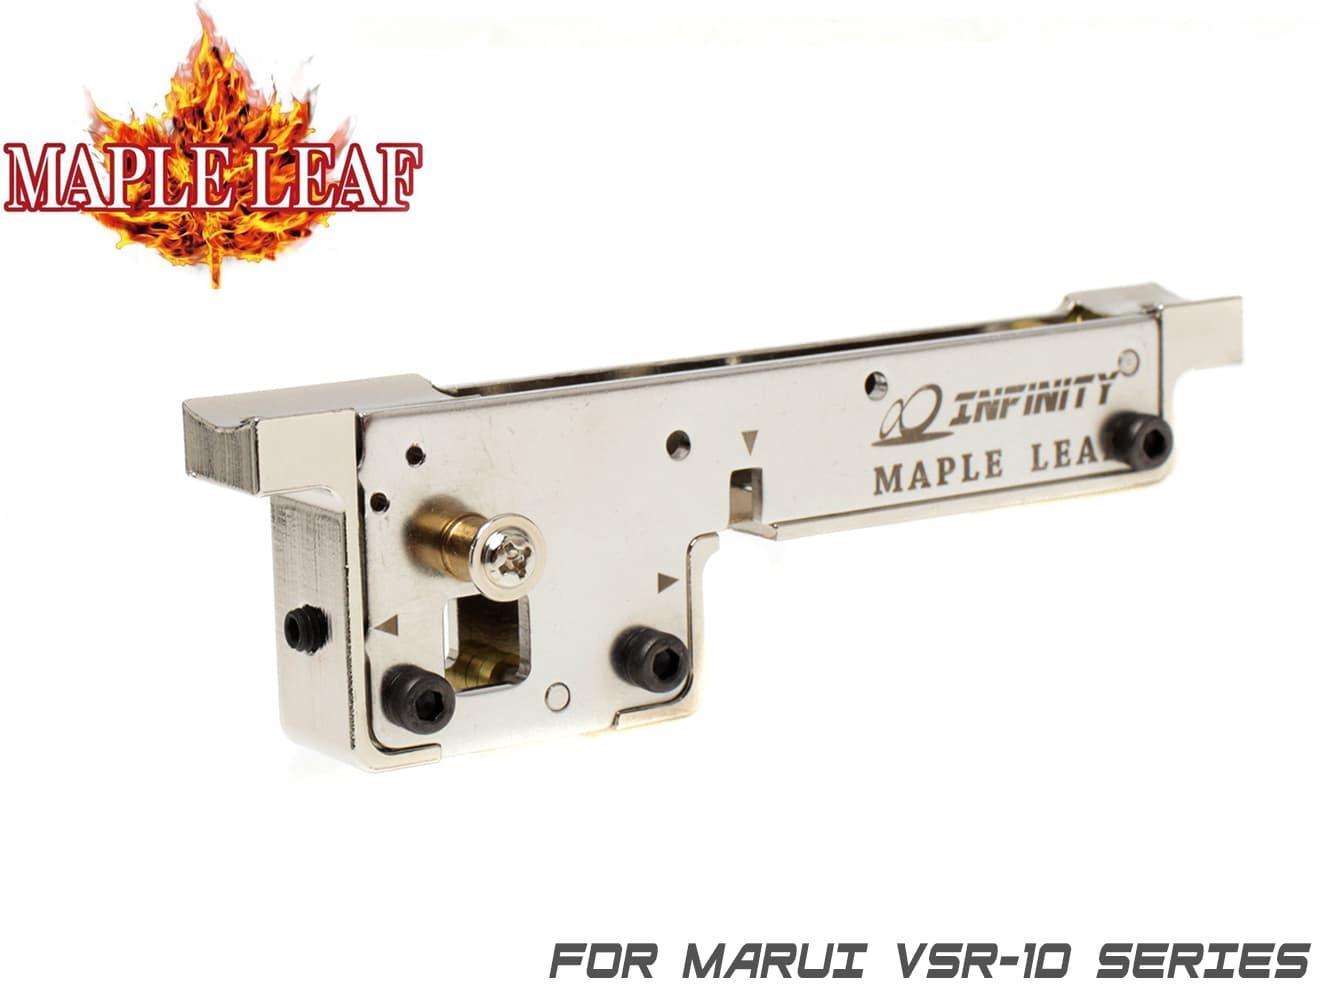 Maple Leaf VSR-10 スチールCNCトリガーボックス◆高精度 トリガーハウジング 東京マルイ VSR-10対応 強度アップ スチール削り出し メイプルリーフ製 メッキ処理